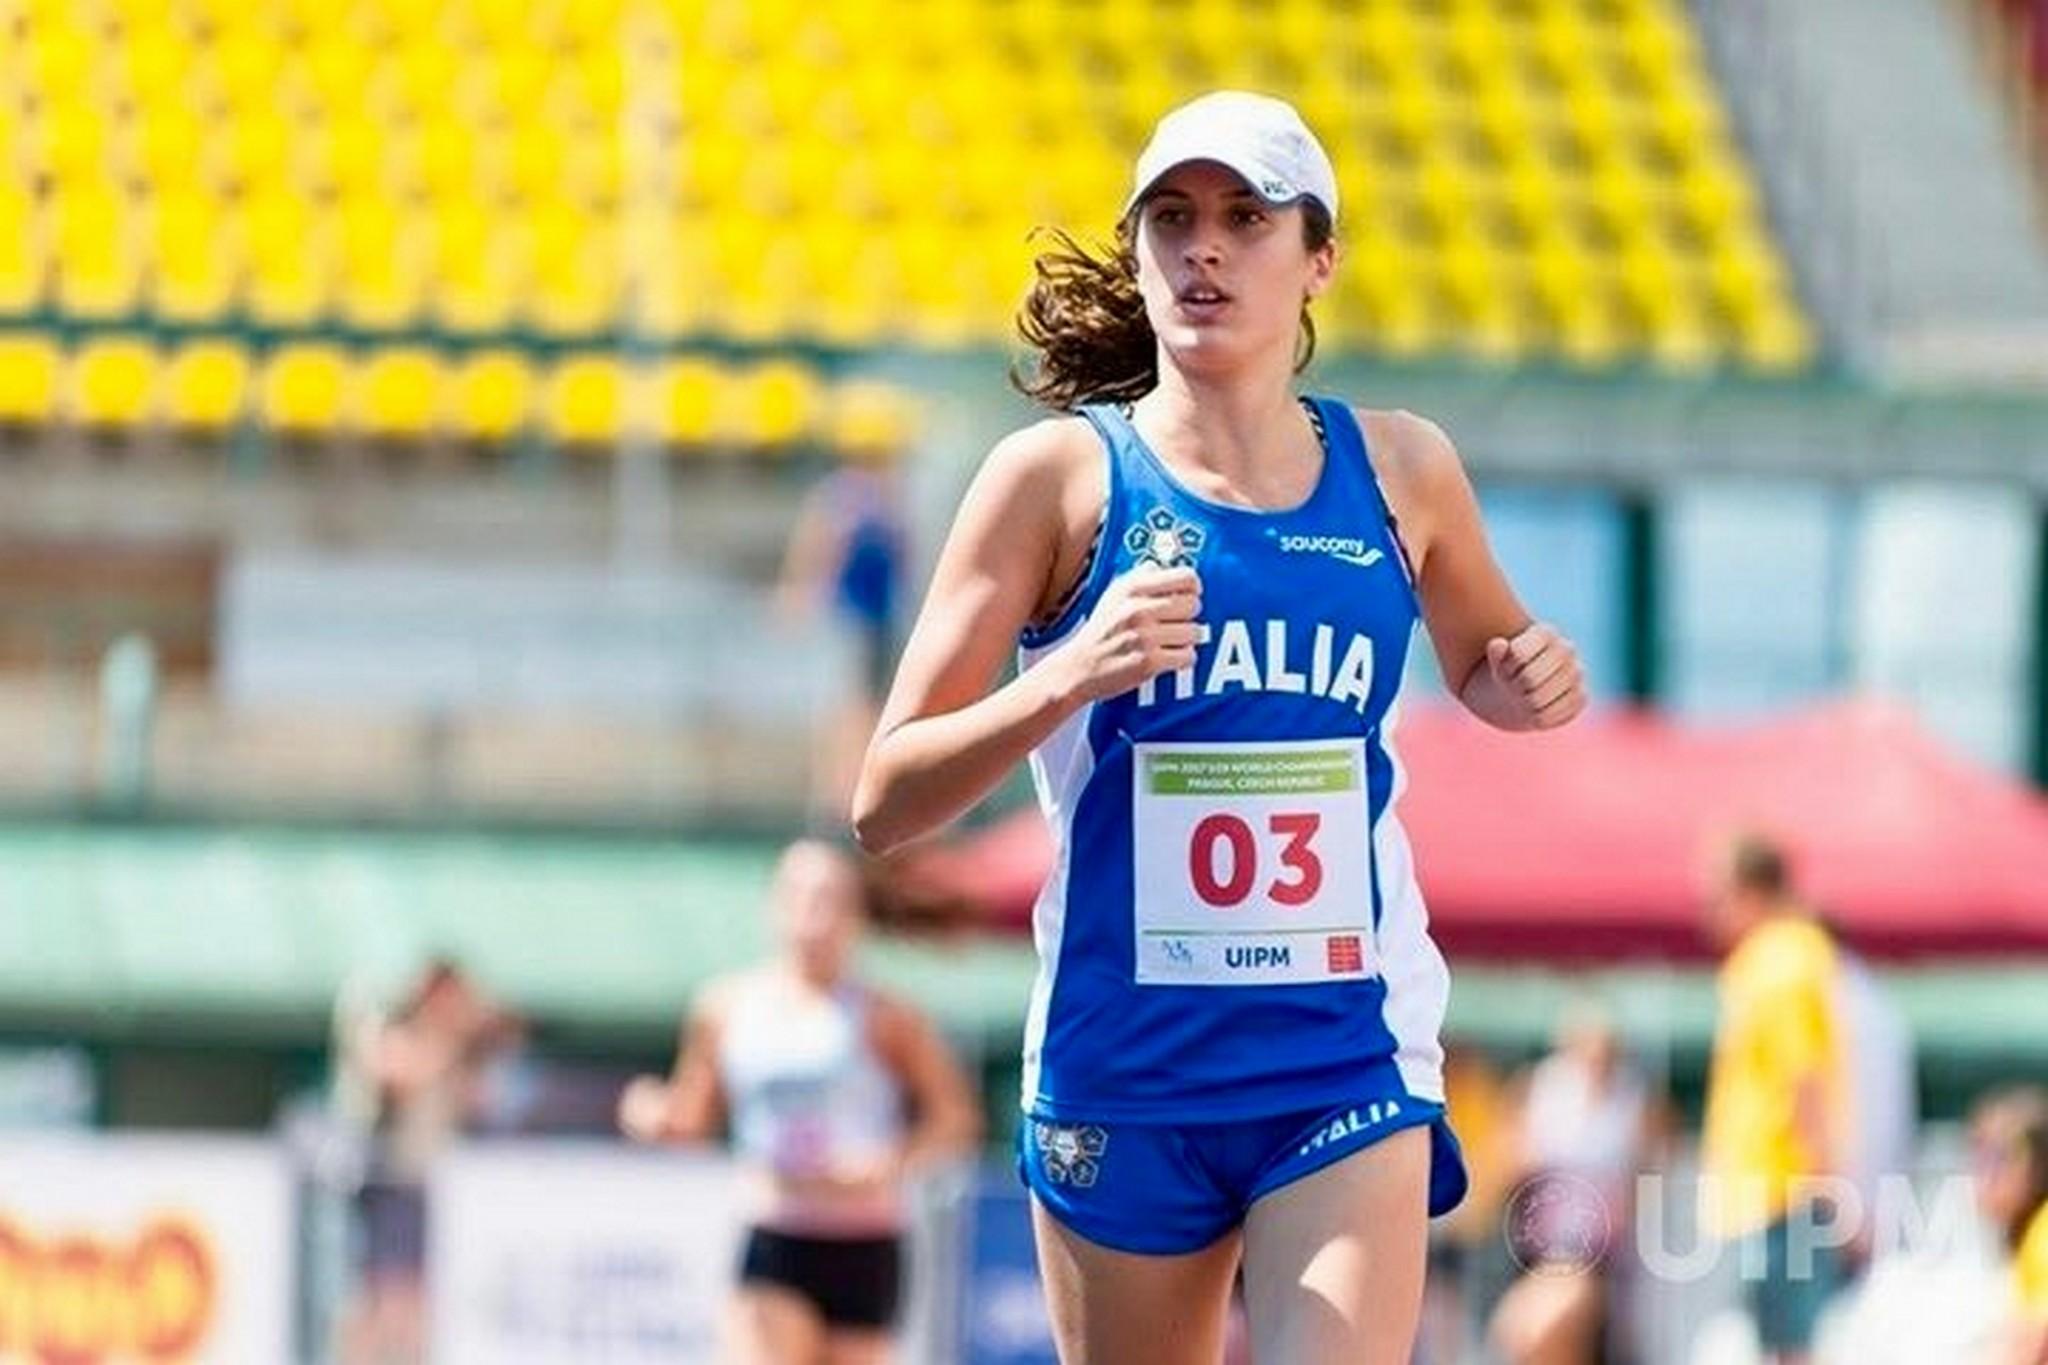 pentathlon finale coppa del mondo 2019 tokyo elena micheli italia italy pentathlon moderno world cup finals 2019 modern pentathlon top 10